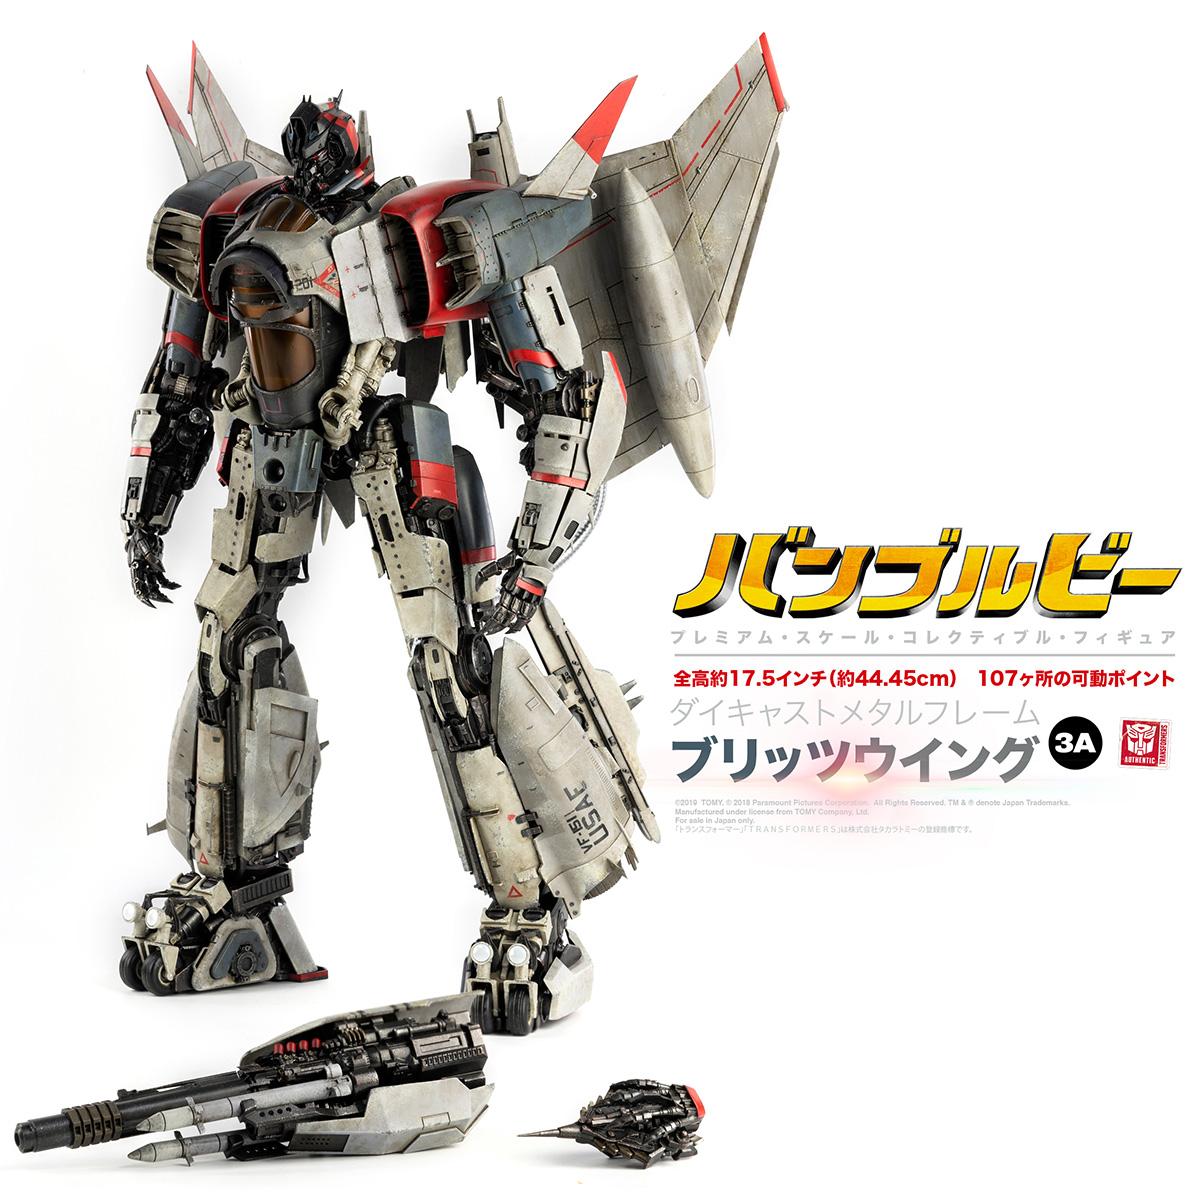 Blitzwing_PM_JAP_0932.jpg